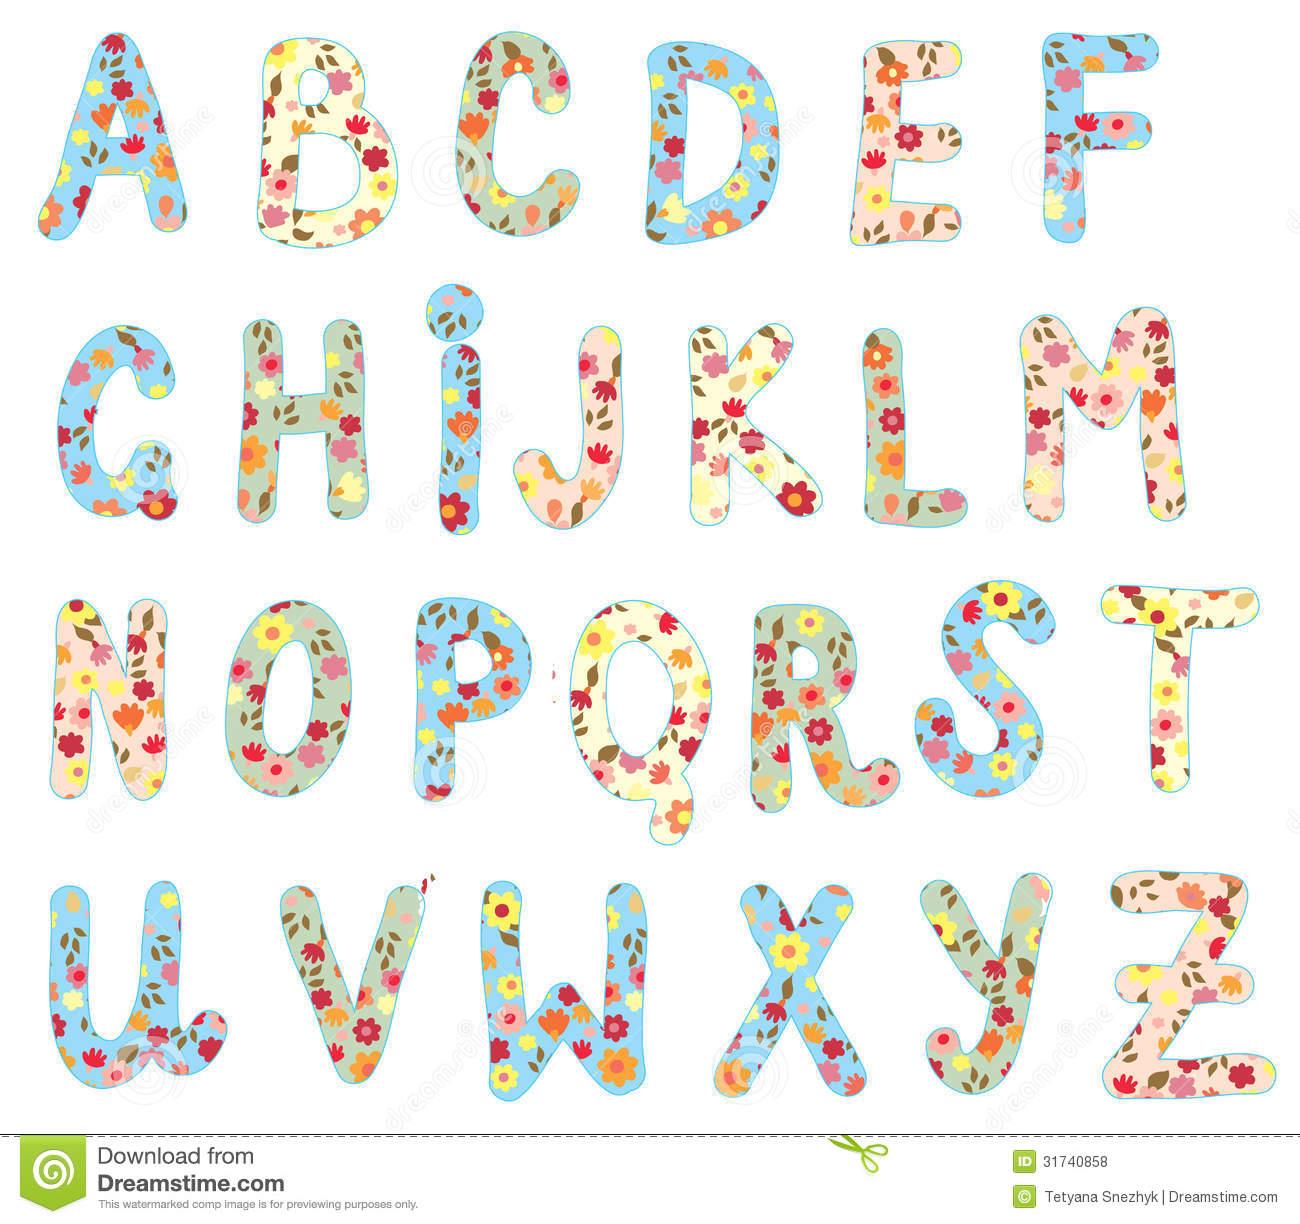 8 Best Images of Cute Alphabet Letters Printable - Cute ... Cute Alphabets